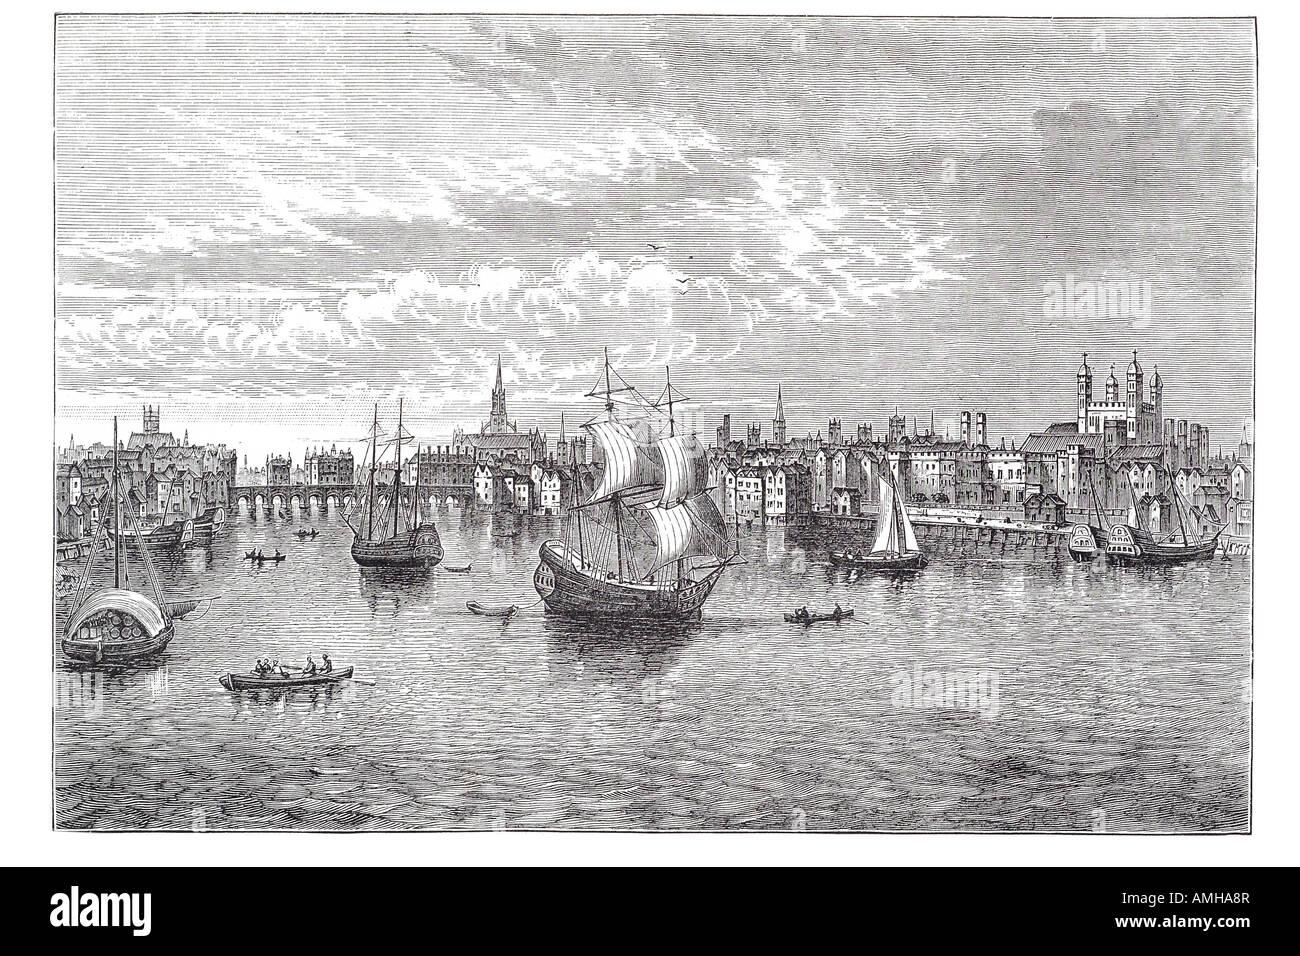 1550 south east river Thames sailing ship boat trade transport London City capital England English Britain British - Stock Image